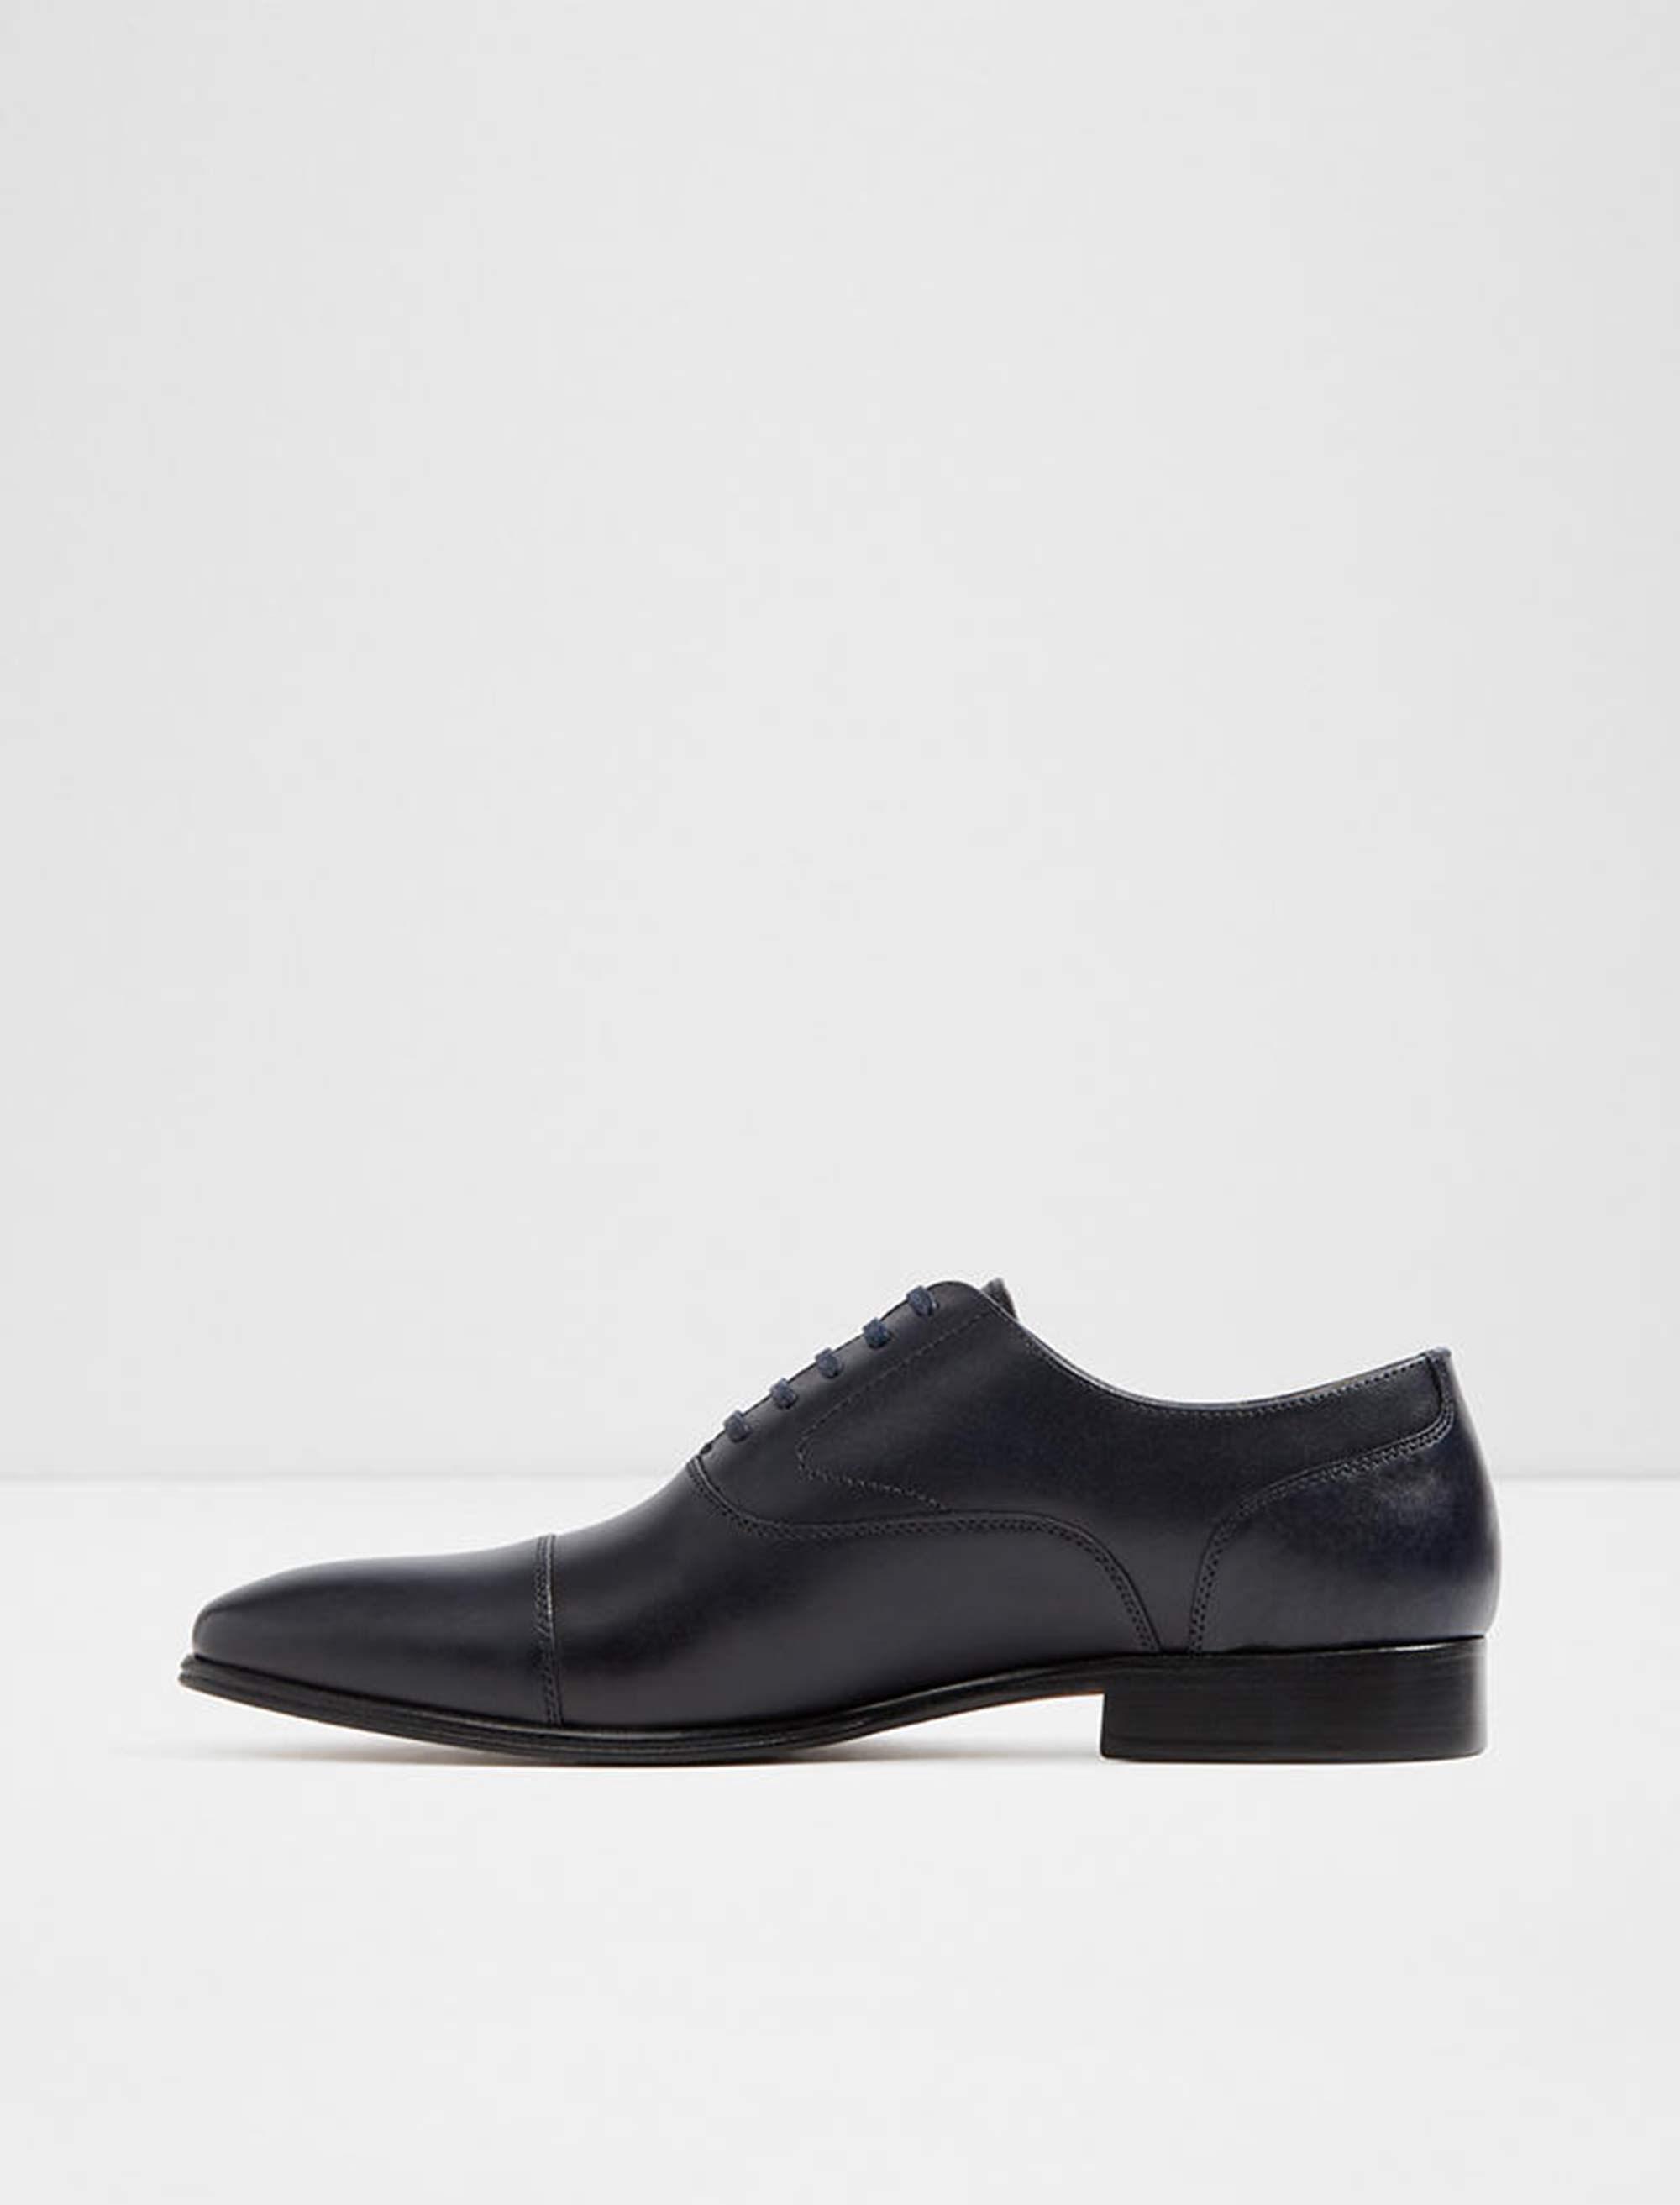 کفش رسمی چرم مردانه - سرمه اي - 2